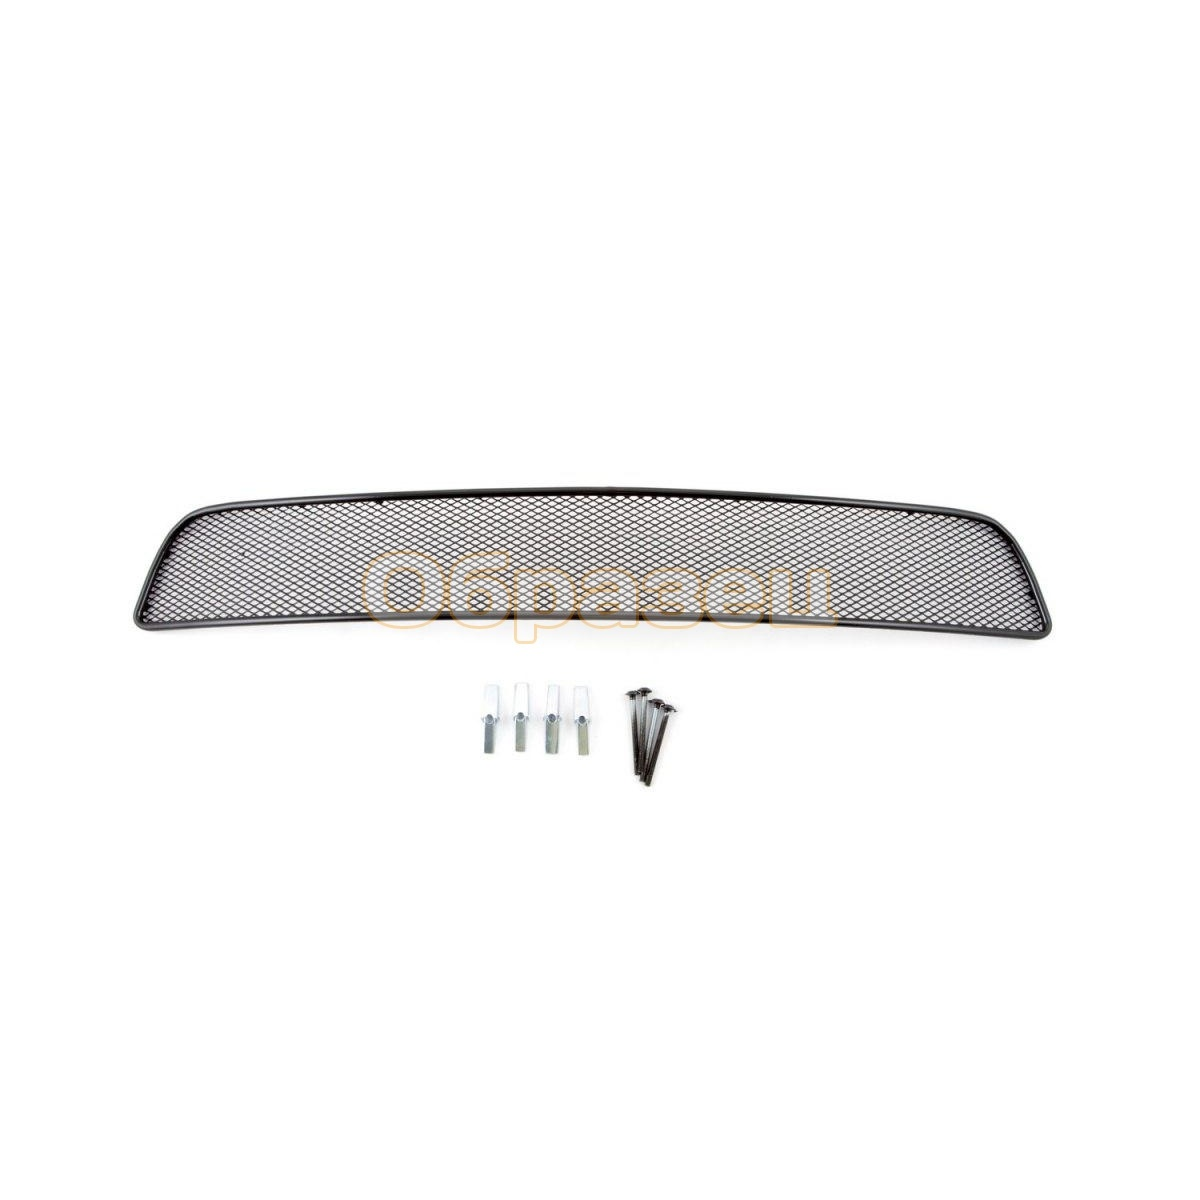 Mesh On Bumper External For Chevrolet Lacetti Hatchback 2004-2013 BLK